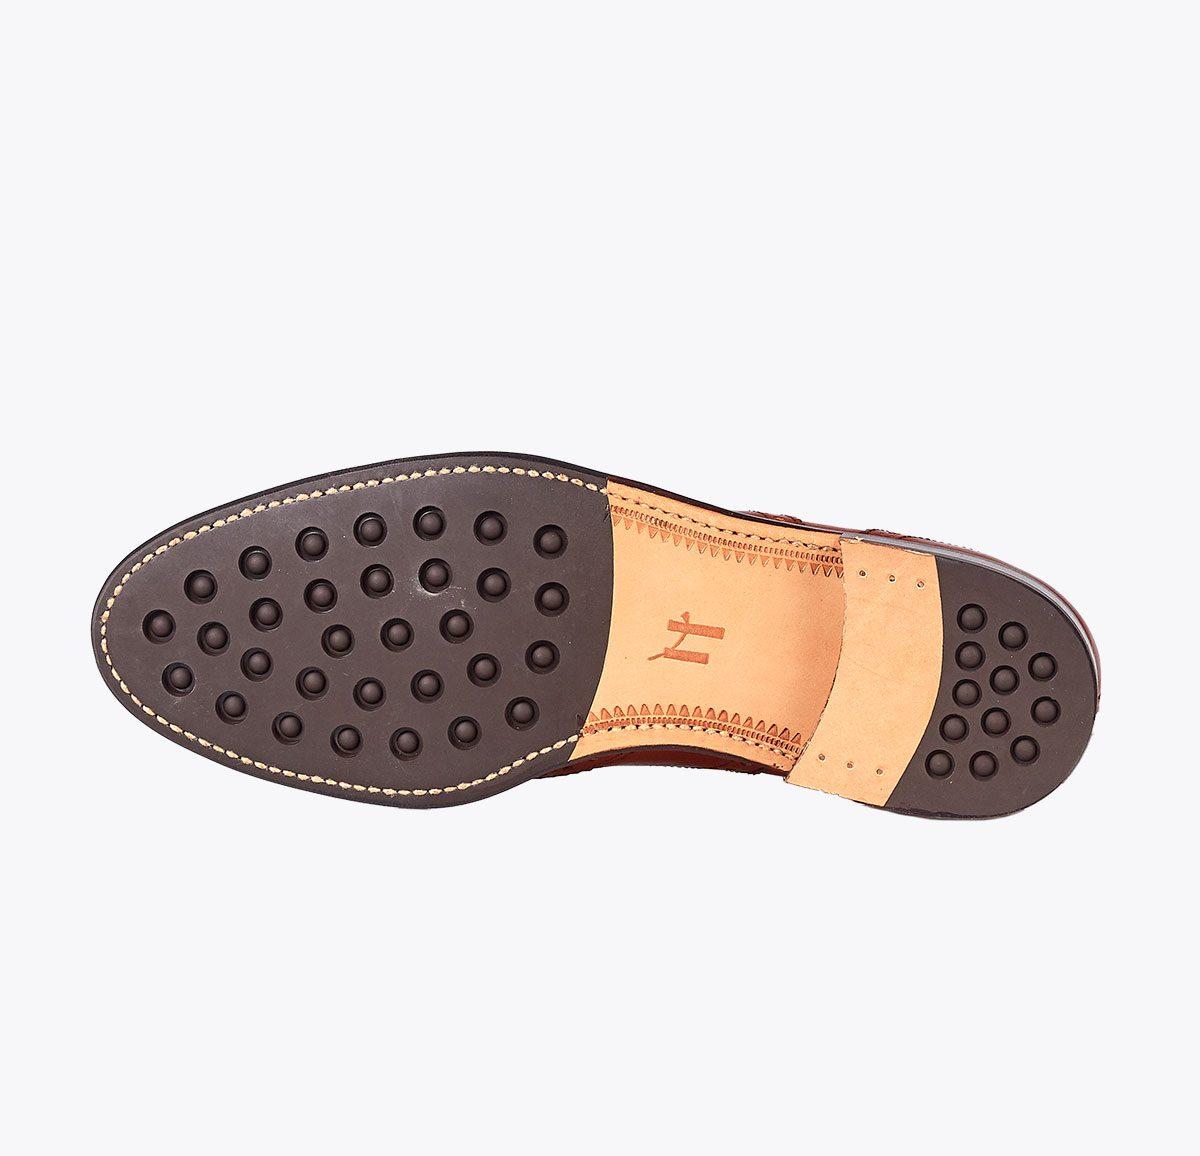 Zapato Inglés hecho a mano en mandalashoes, Santanyí Mallorca. Hand made shoes. Nach Mass Schuhe